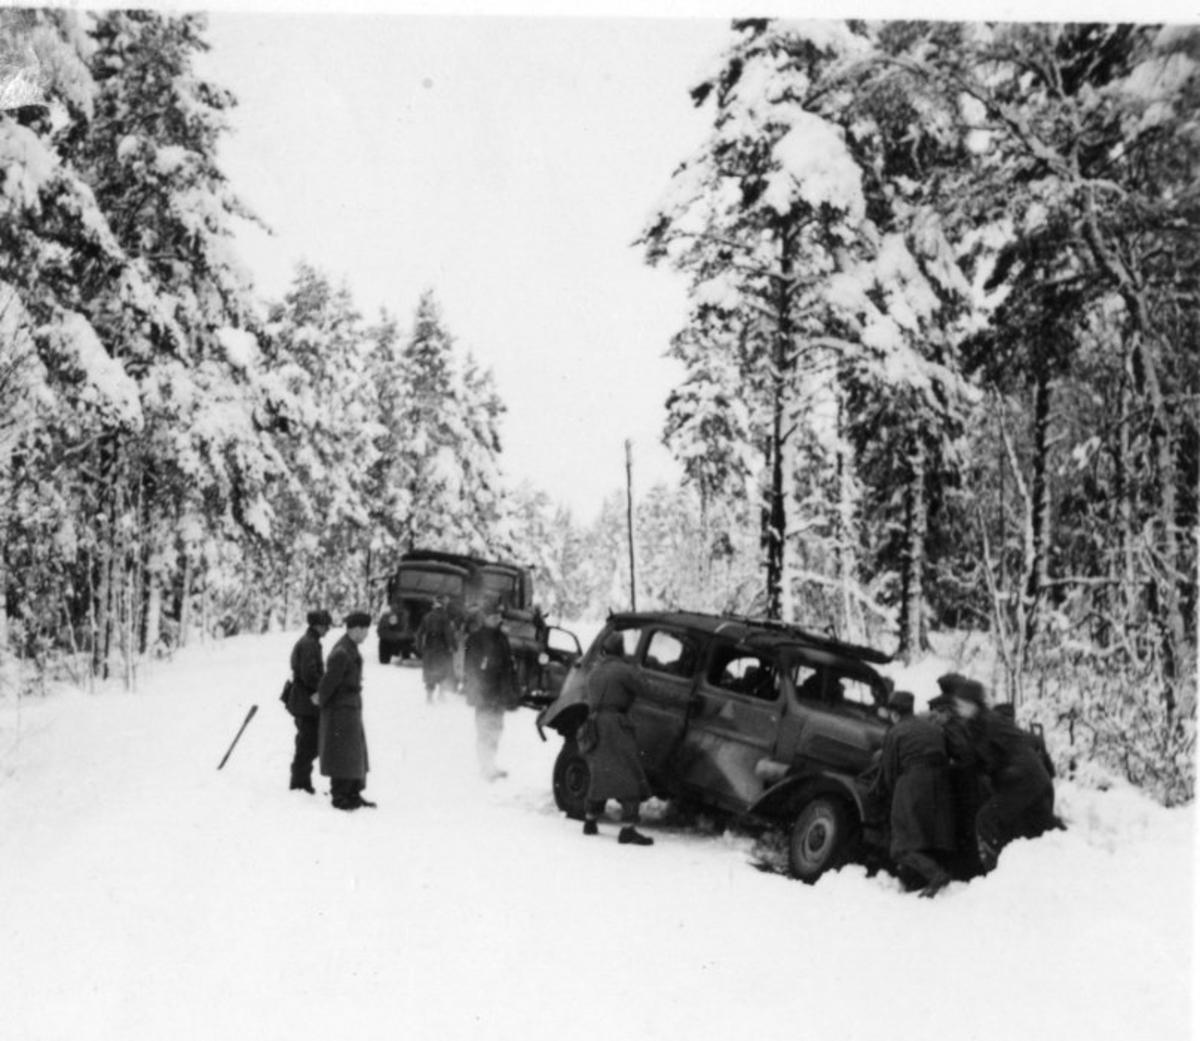 Terrängpersonvagn m/1943 (TPV). Volvo. I diket, vinter.